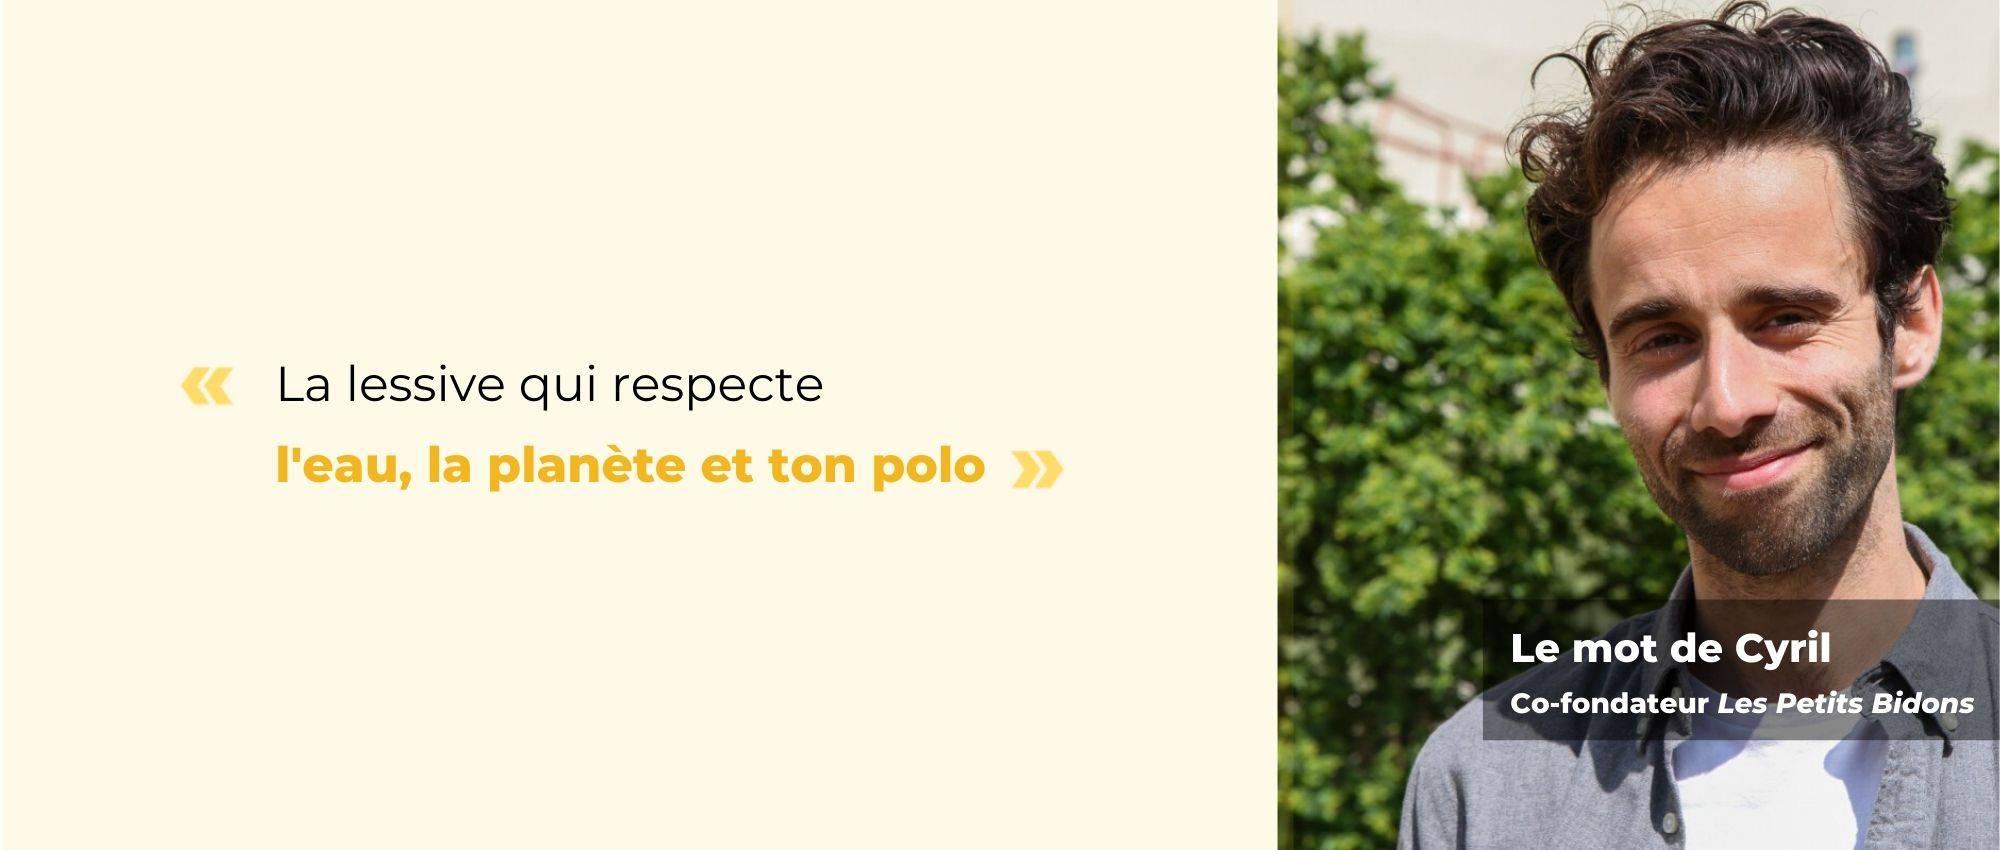 Lessive écologique Romarin - The trust society - Les petits bidons